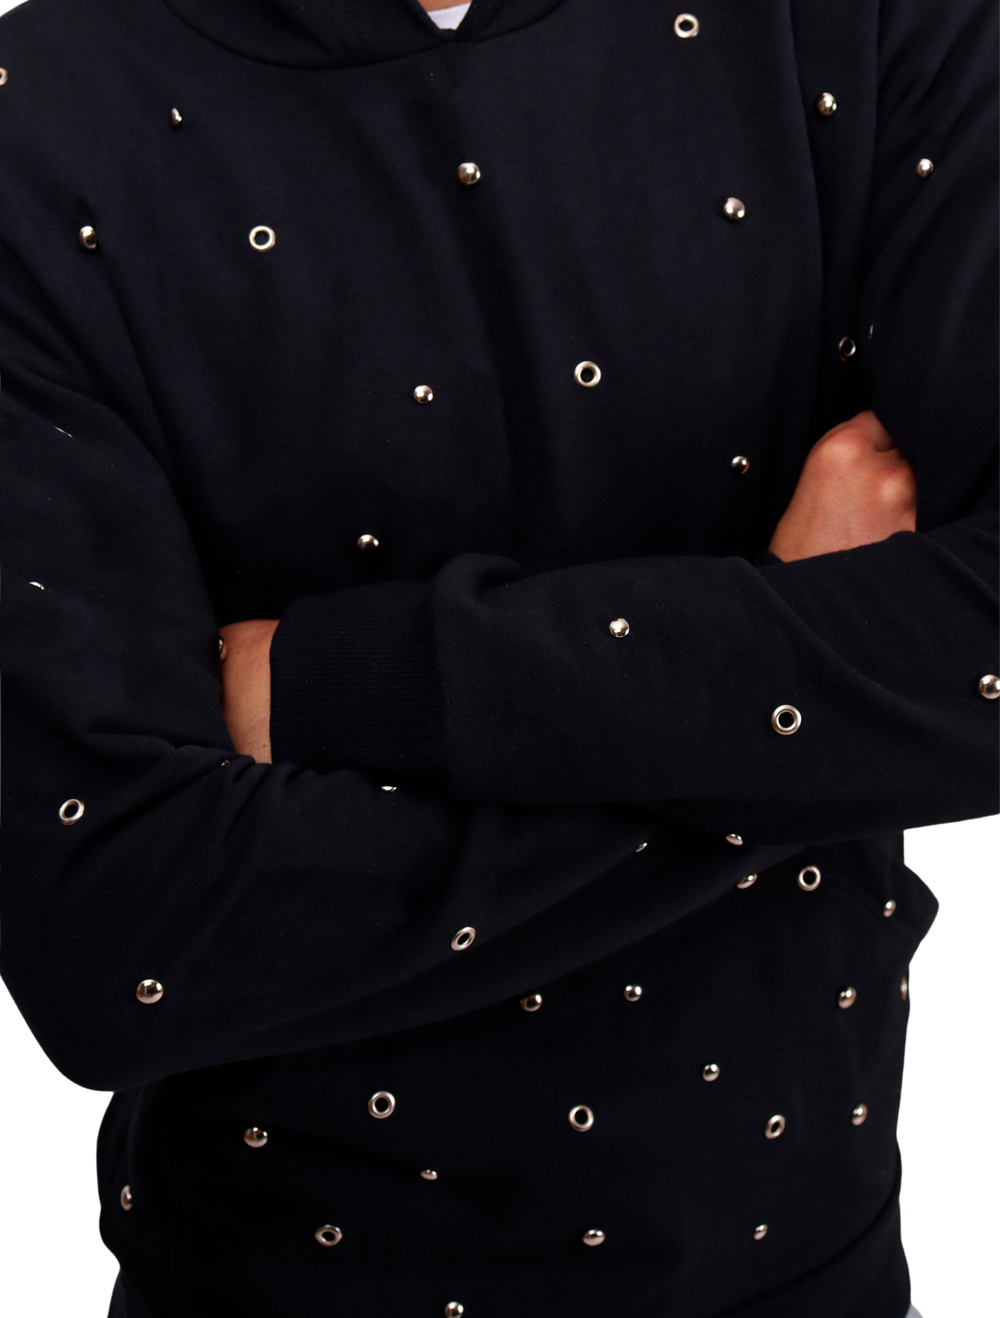 Blusa Moletom Canguru com Rebites Masculina Preto